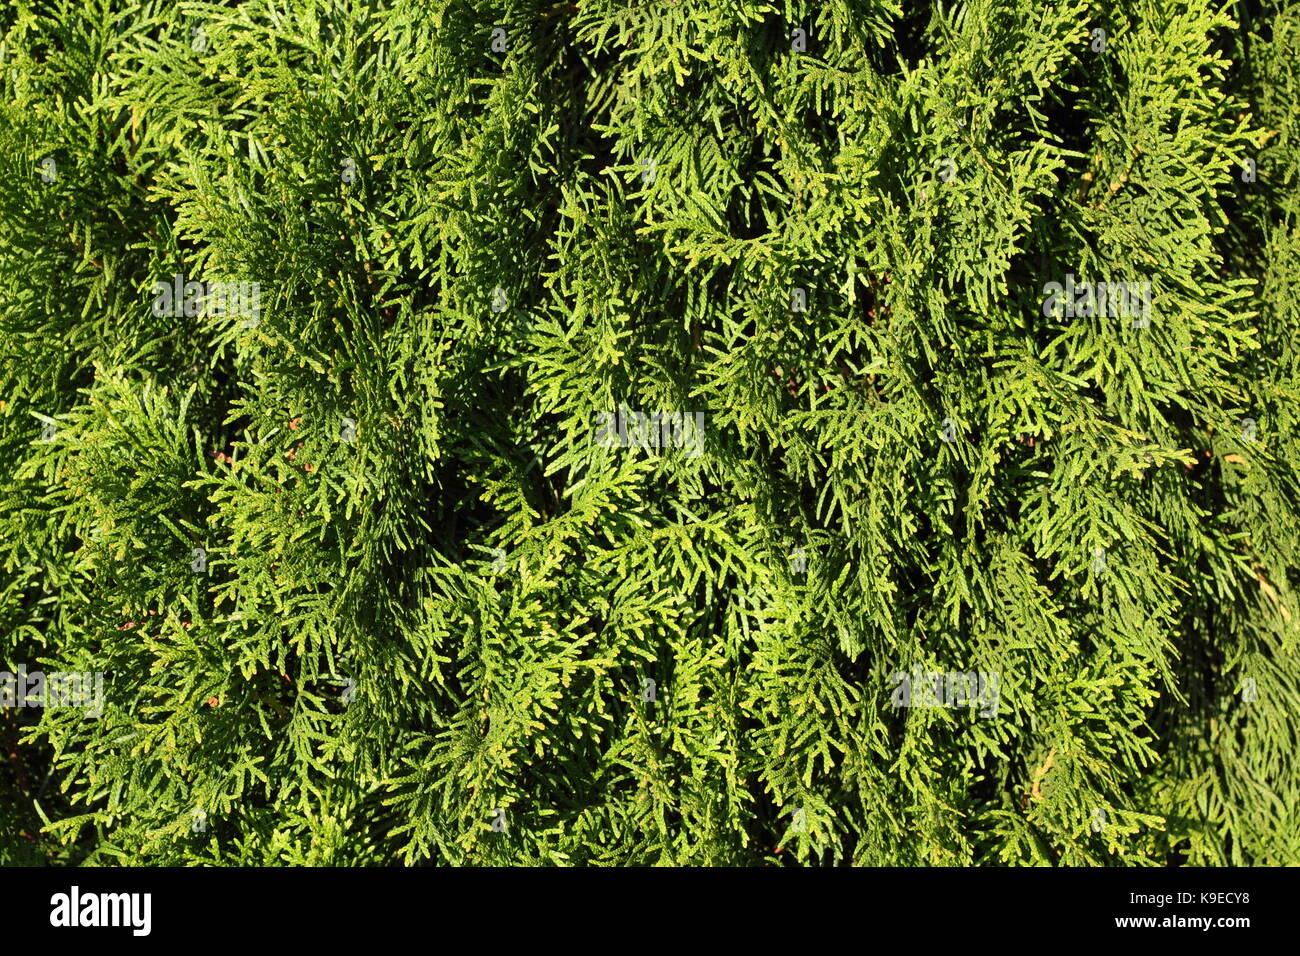 Green foliage background (thuja leaves closeup photo) - Stock Image